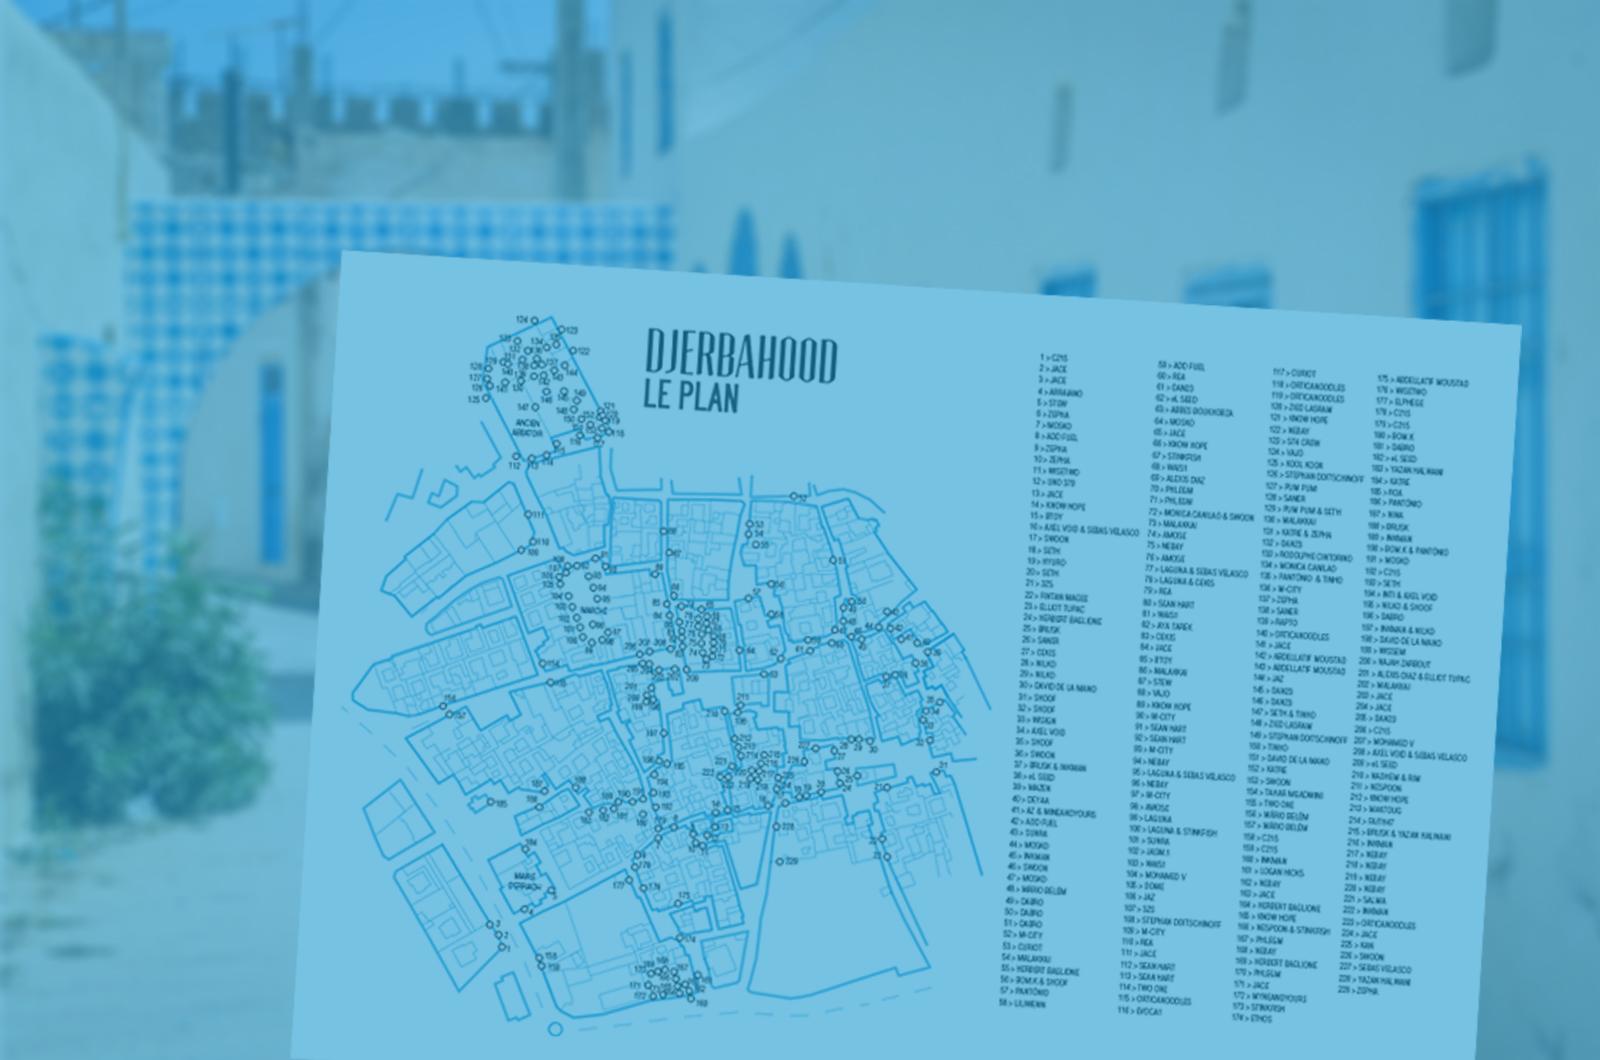 Plan_Djerbahood_Itinerrance_blue